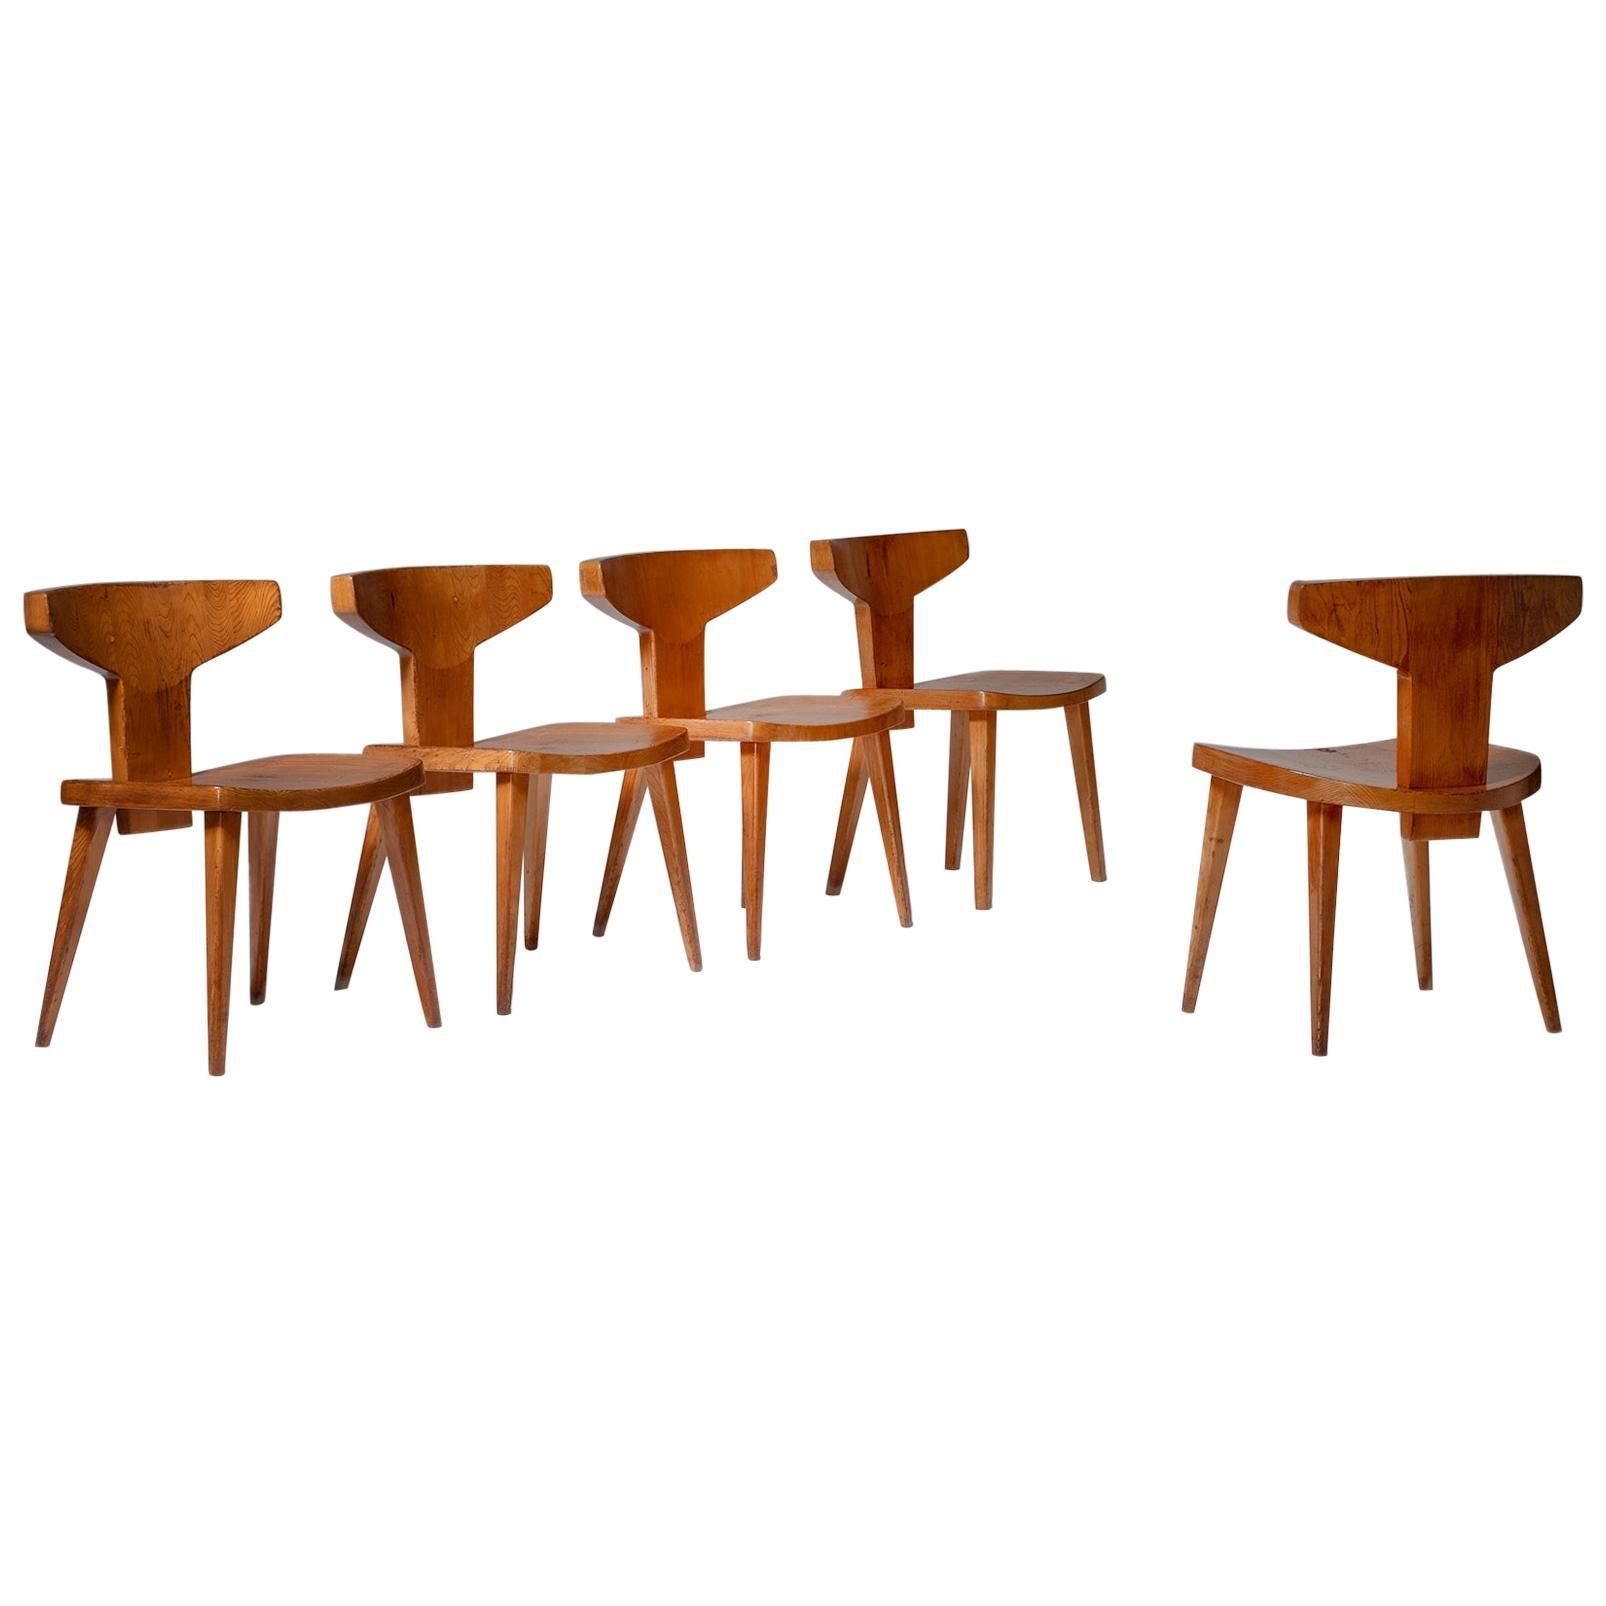 Danish Pine Dining Chairs by Jacob Kielland-Brandt, 1960s